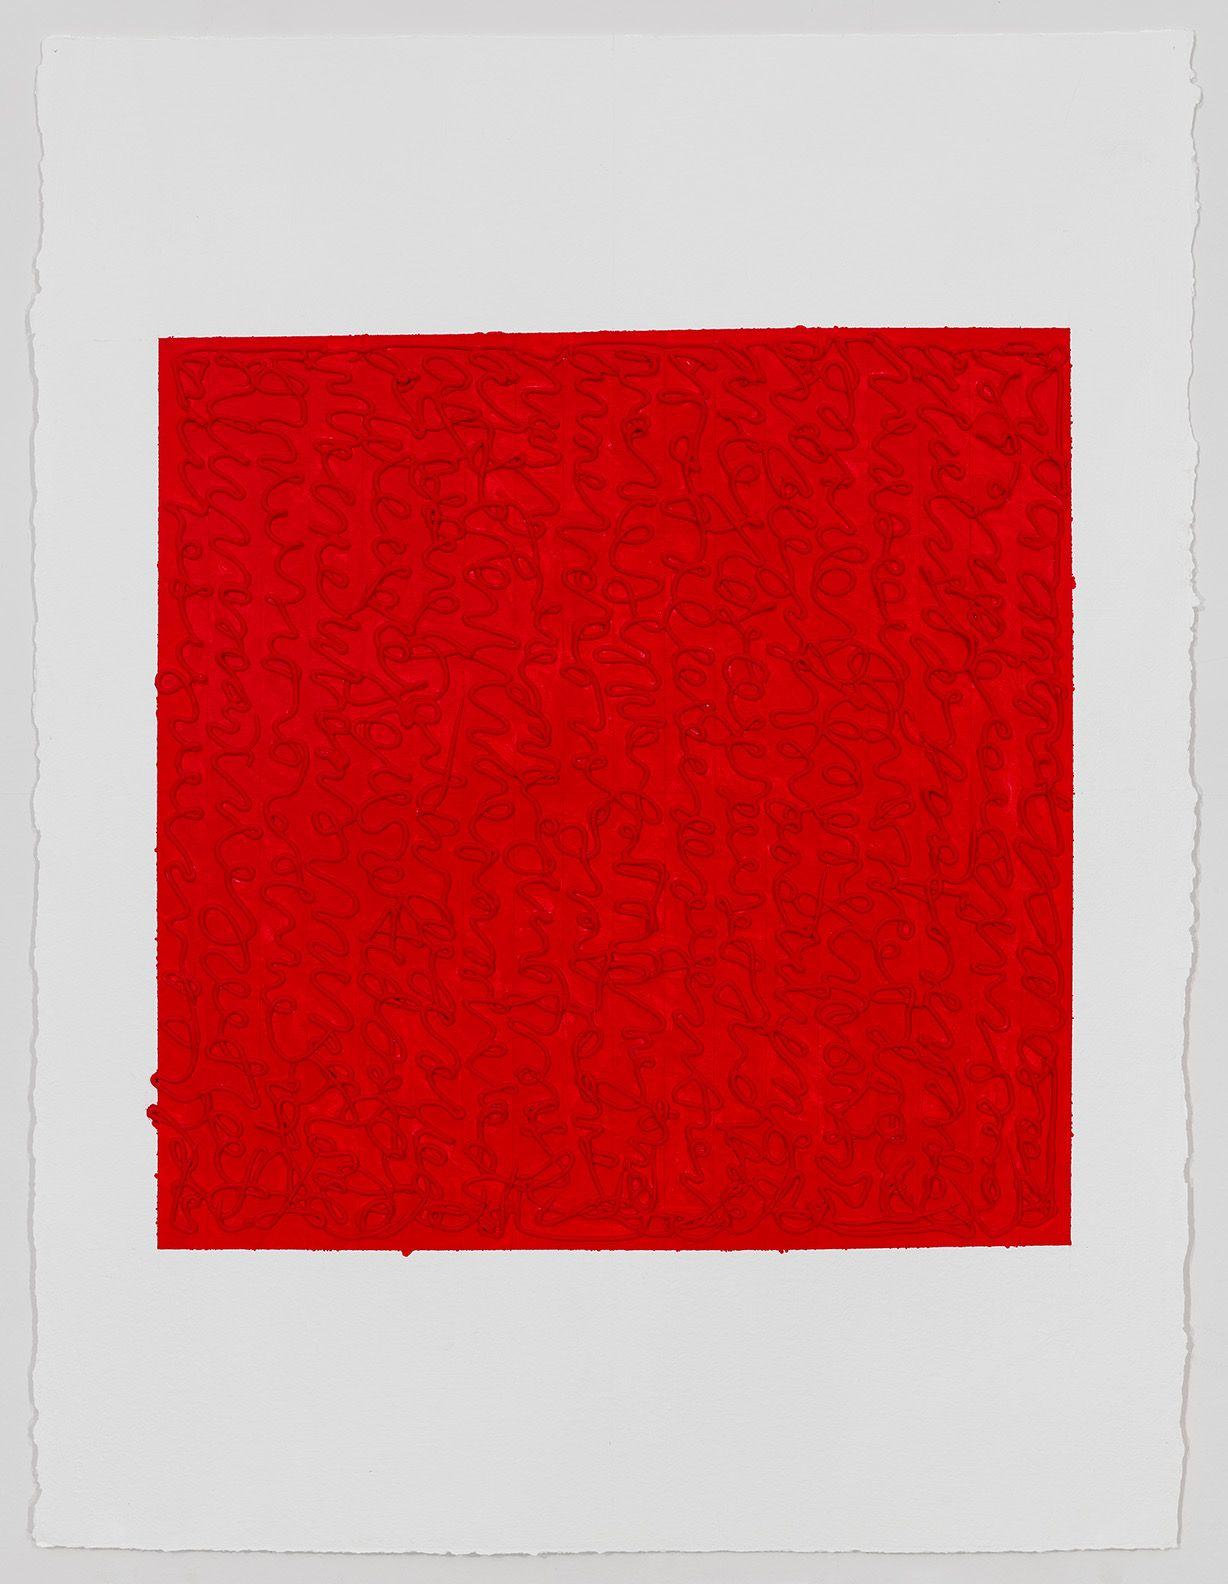 Louise P. Sloane, Reds, 2019